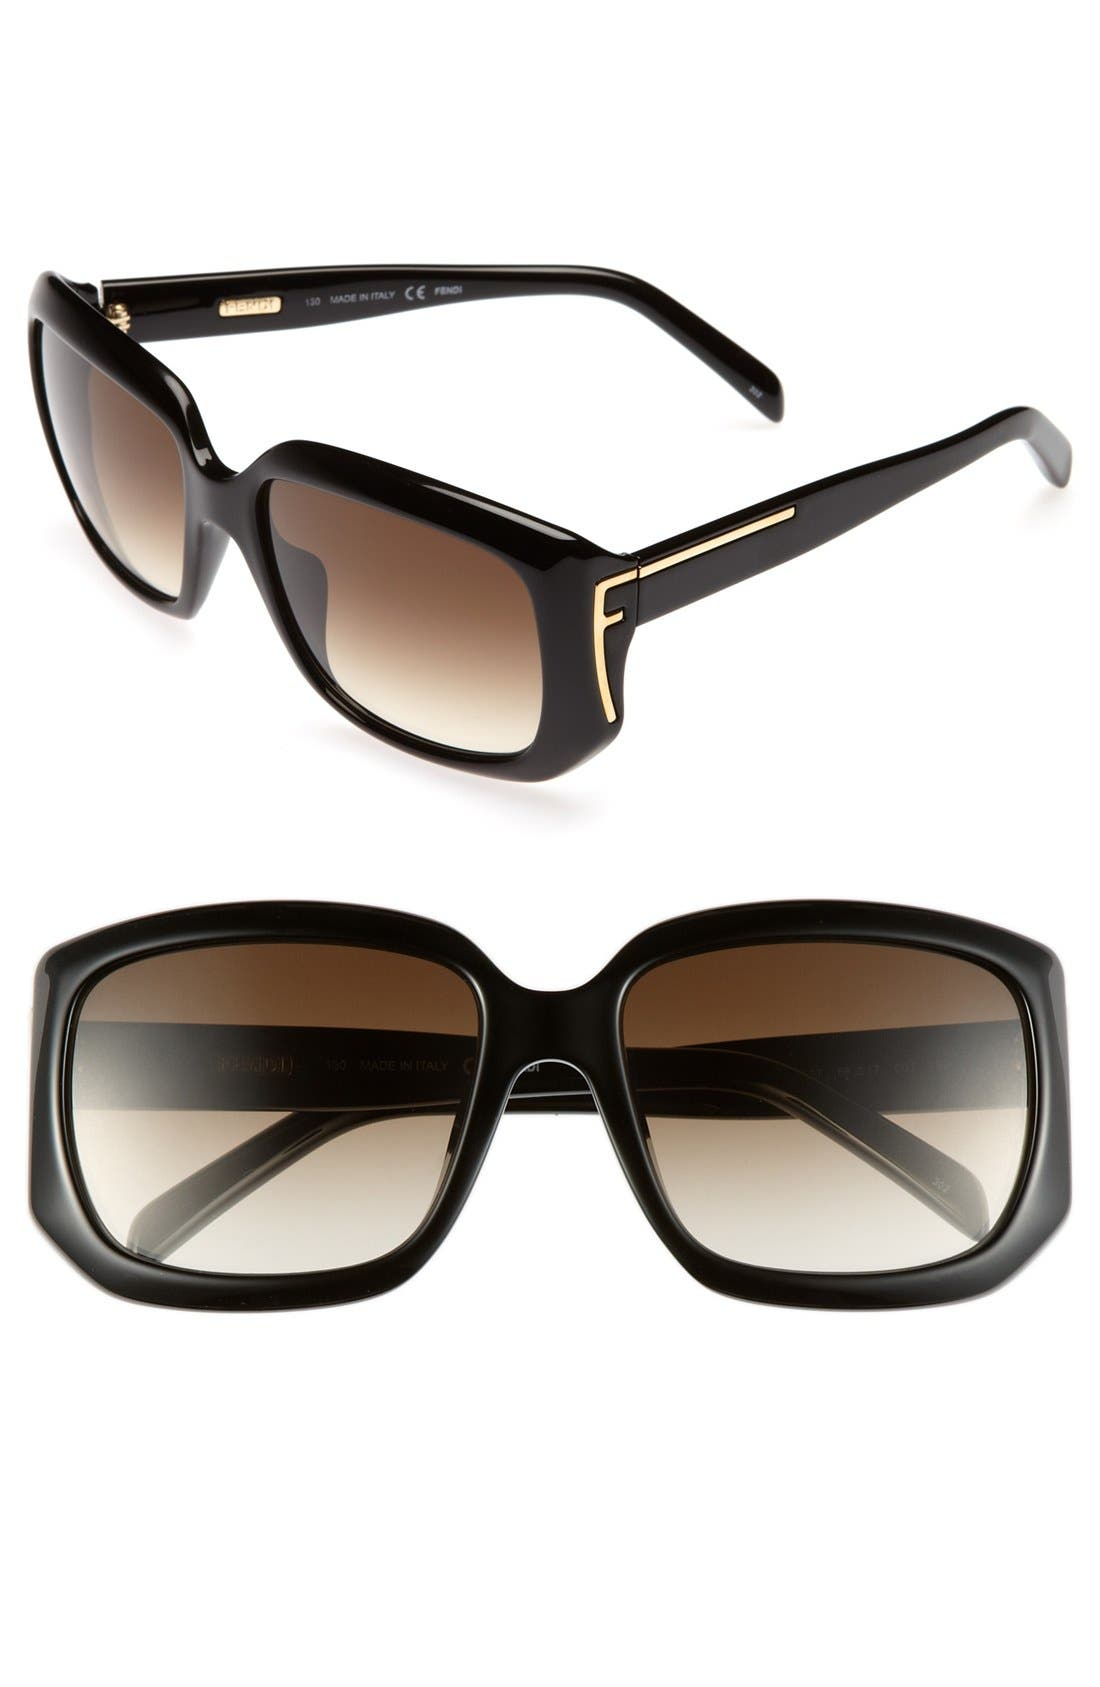 Main Image - Fendi 56mm Oversized Sunglasses